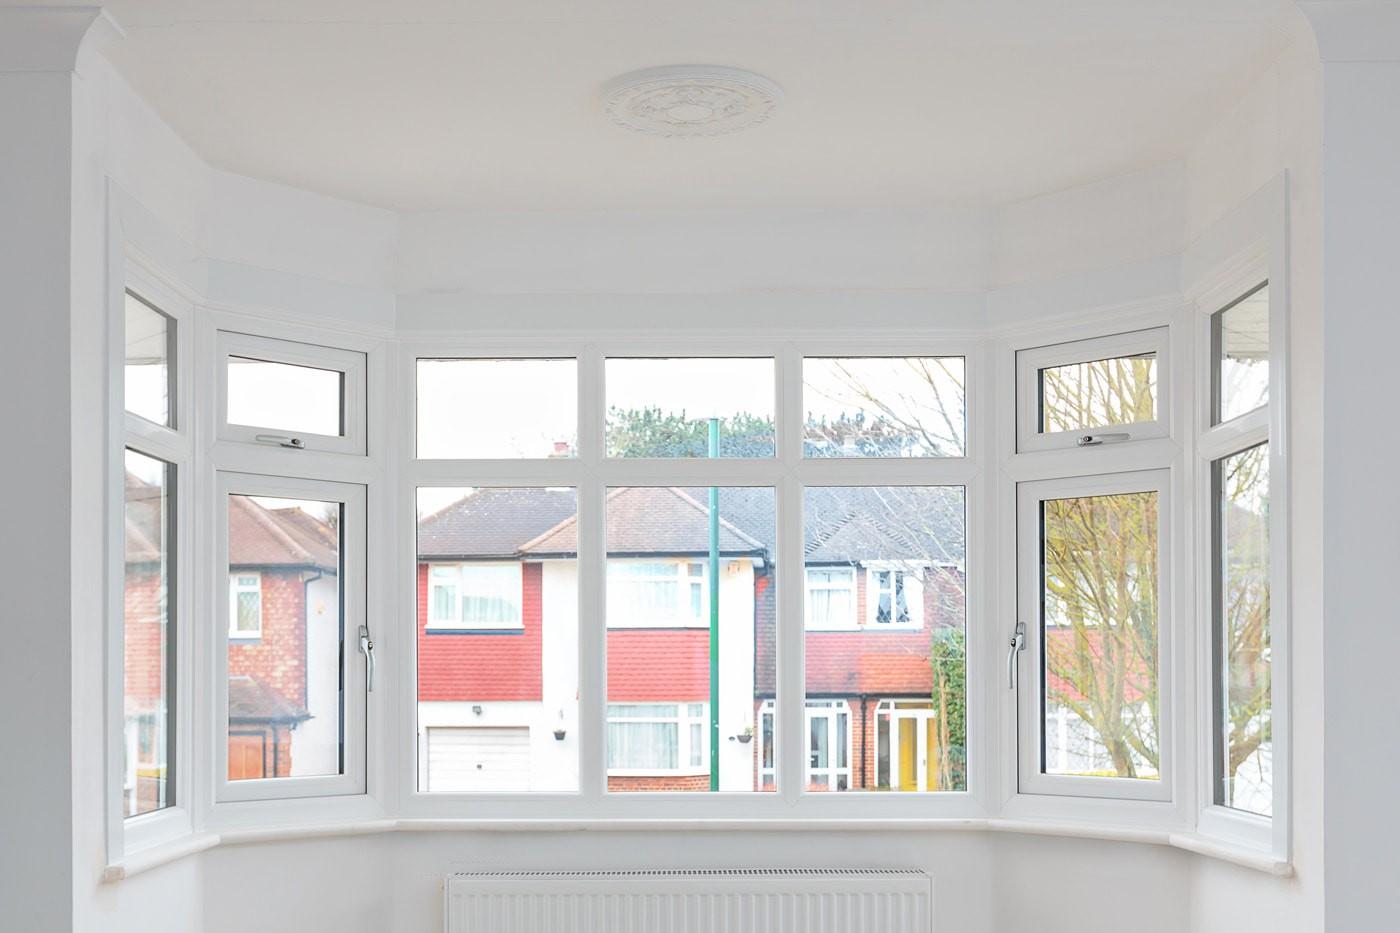 Replacement double glazed uPVC windows in Wallington